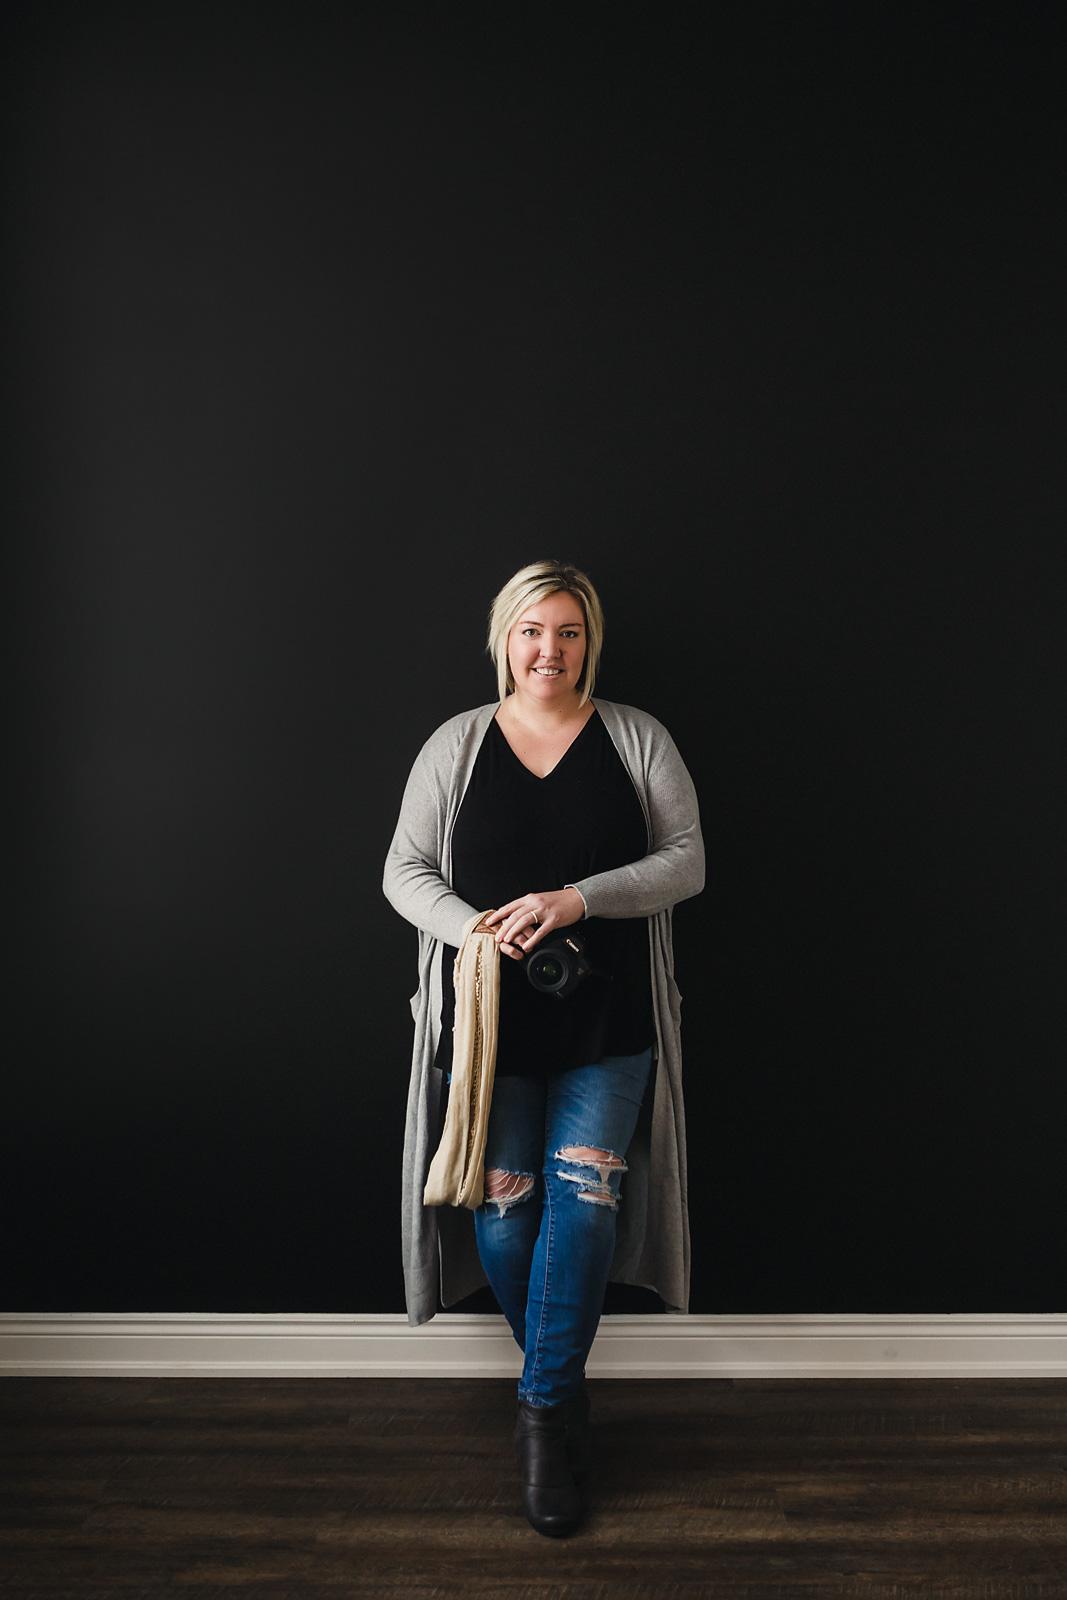 Lyndsey Thomas, Photographer